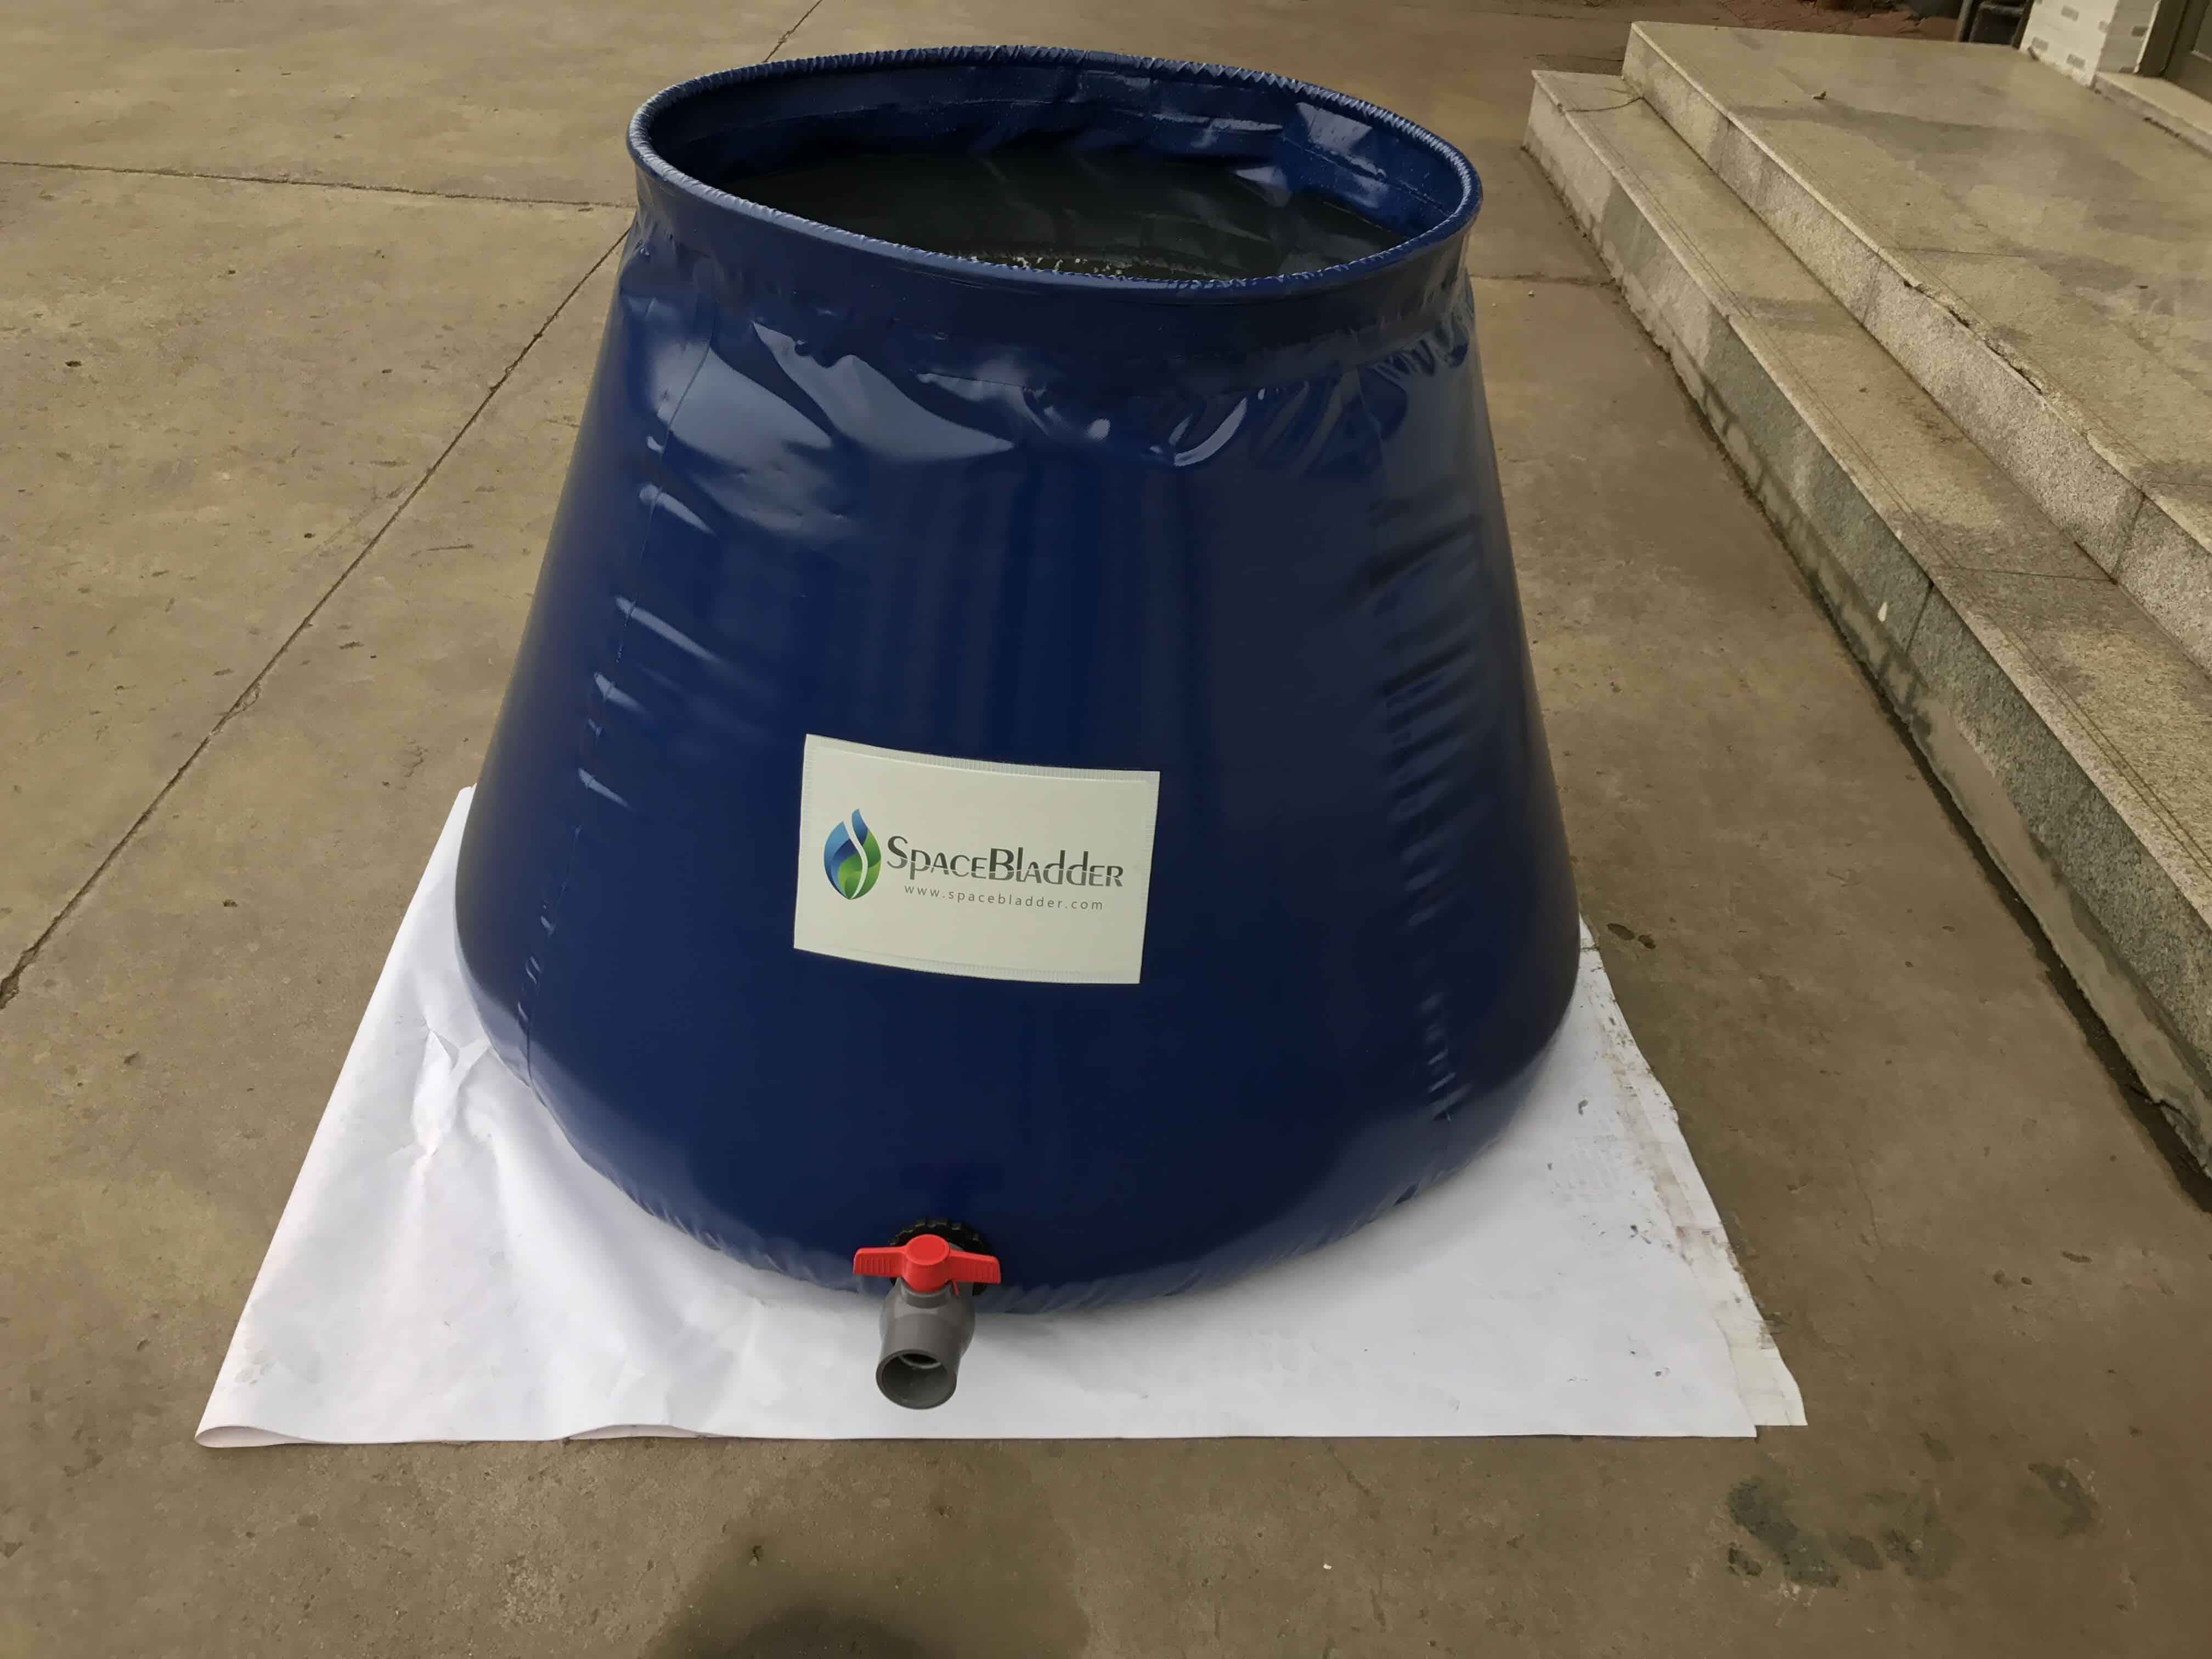 Spacebladder 1,000L Onion Shape Water Storage Tank to The United Kingdom 1